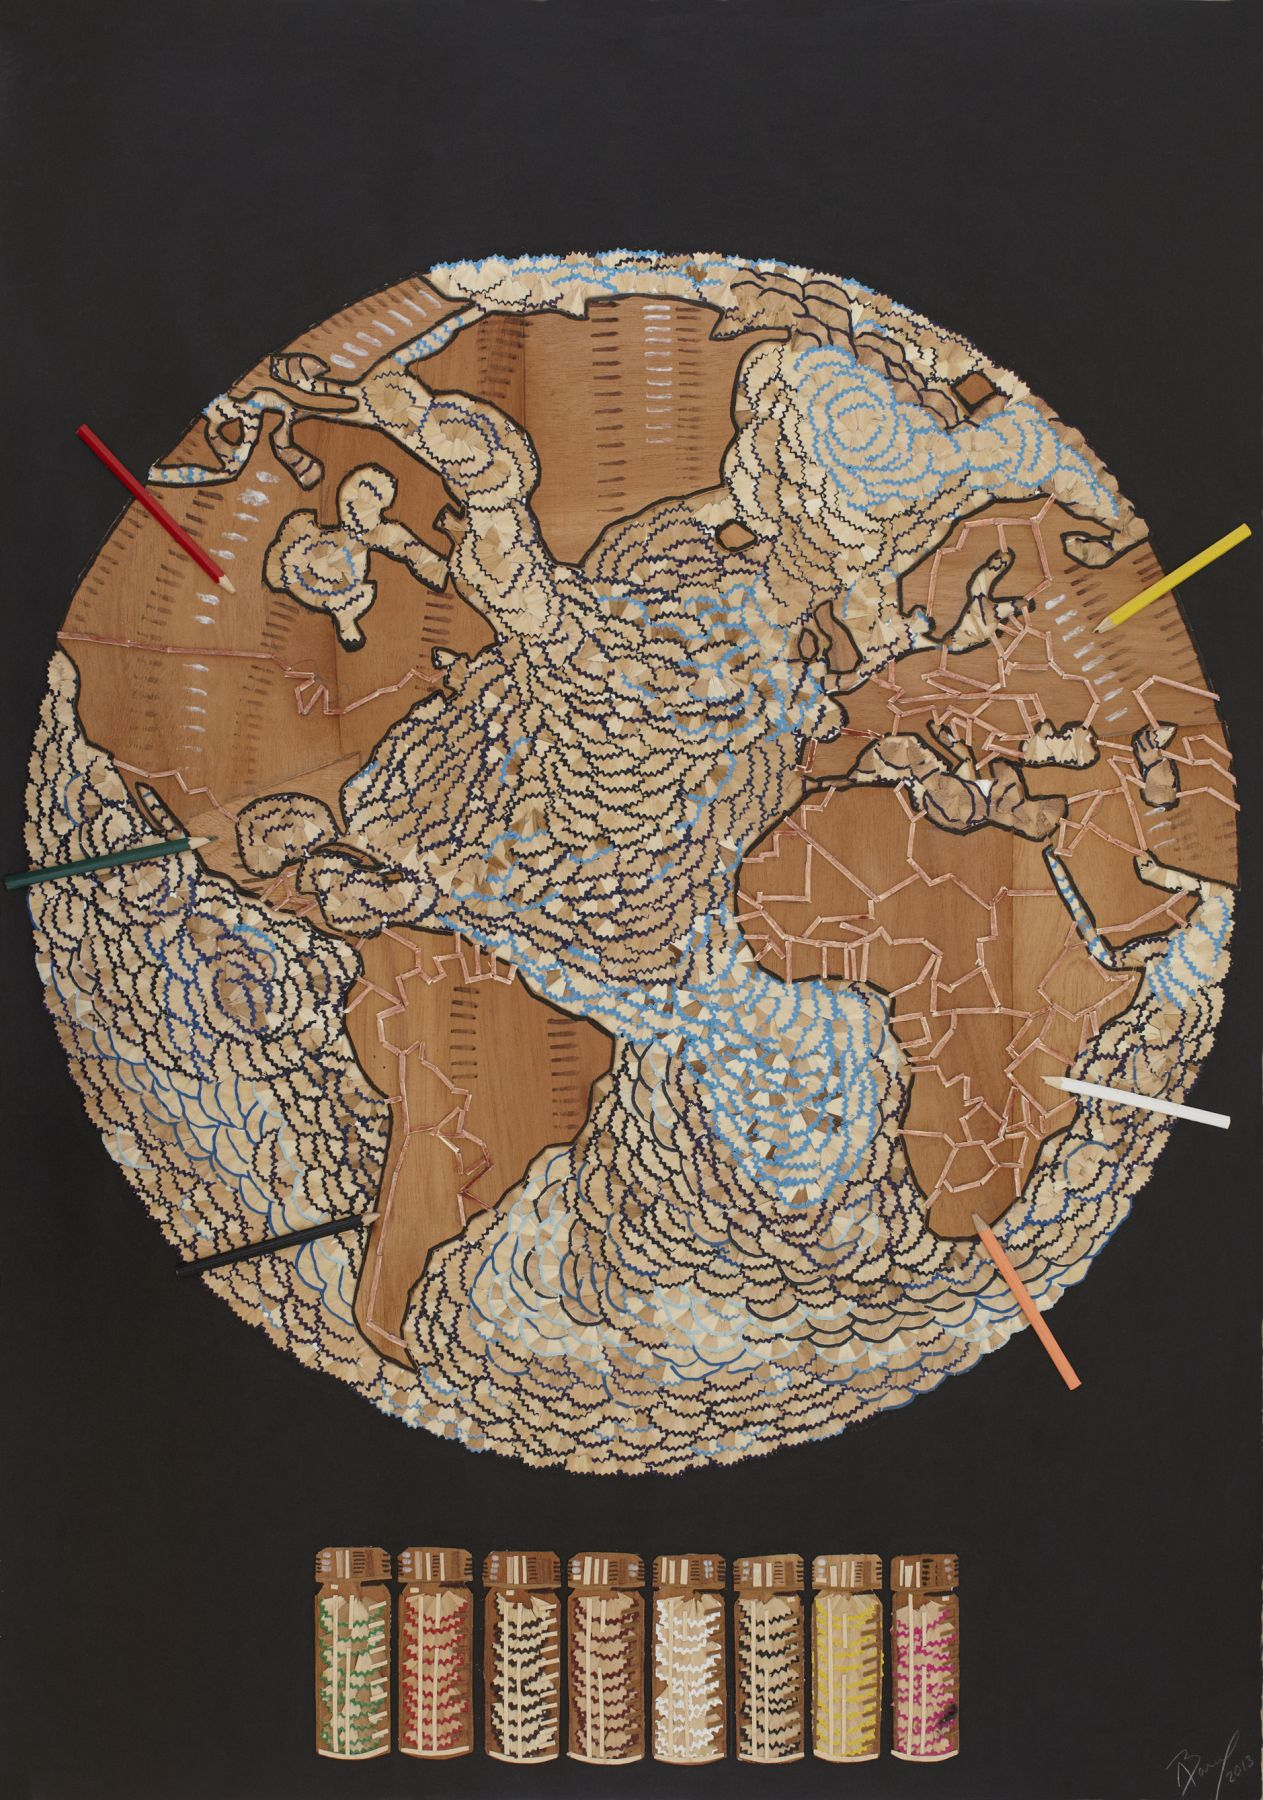 Abel Barroso, Colorea tu Mapa, 2013